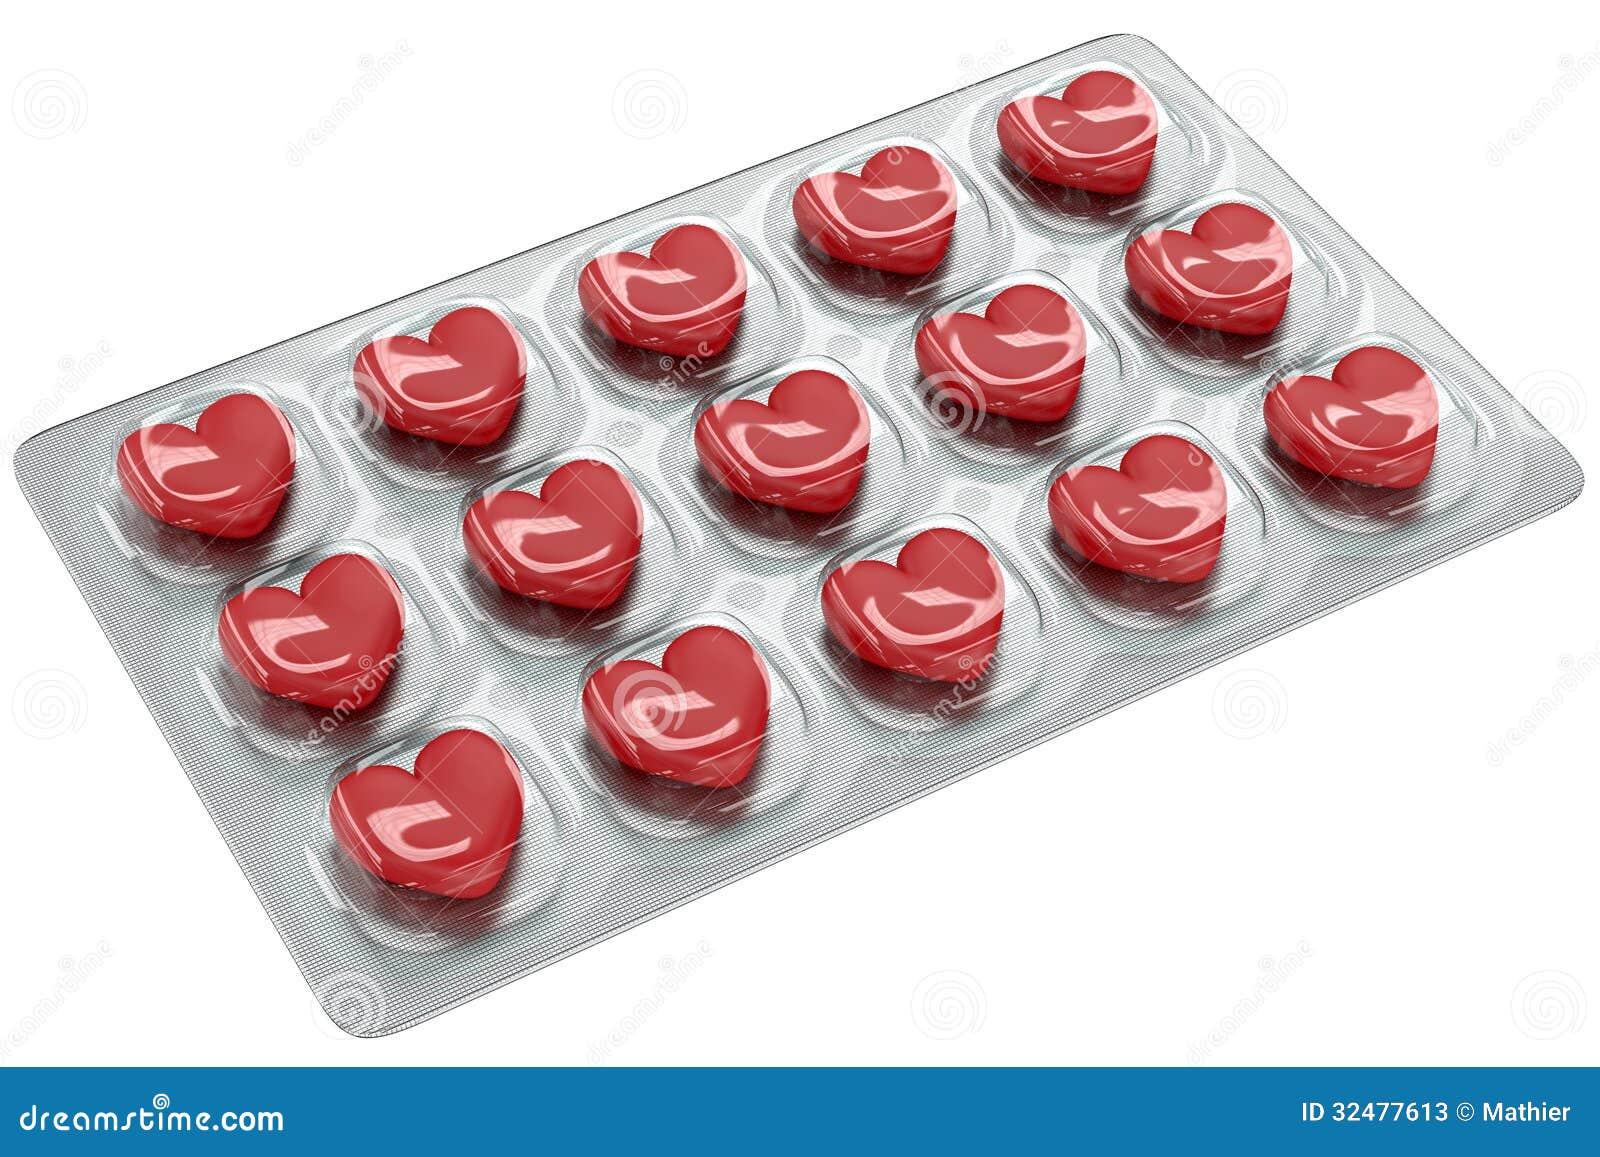 Generic Cialis Pills TrustedOnlinePharmacy